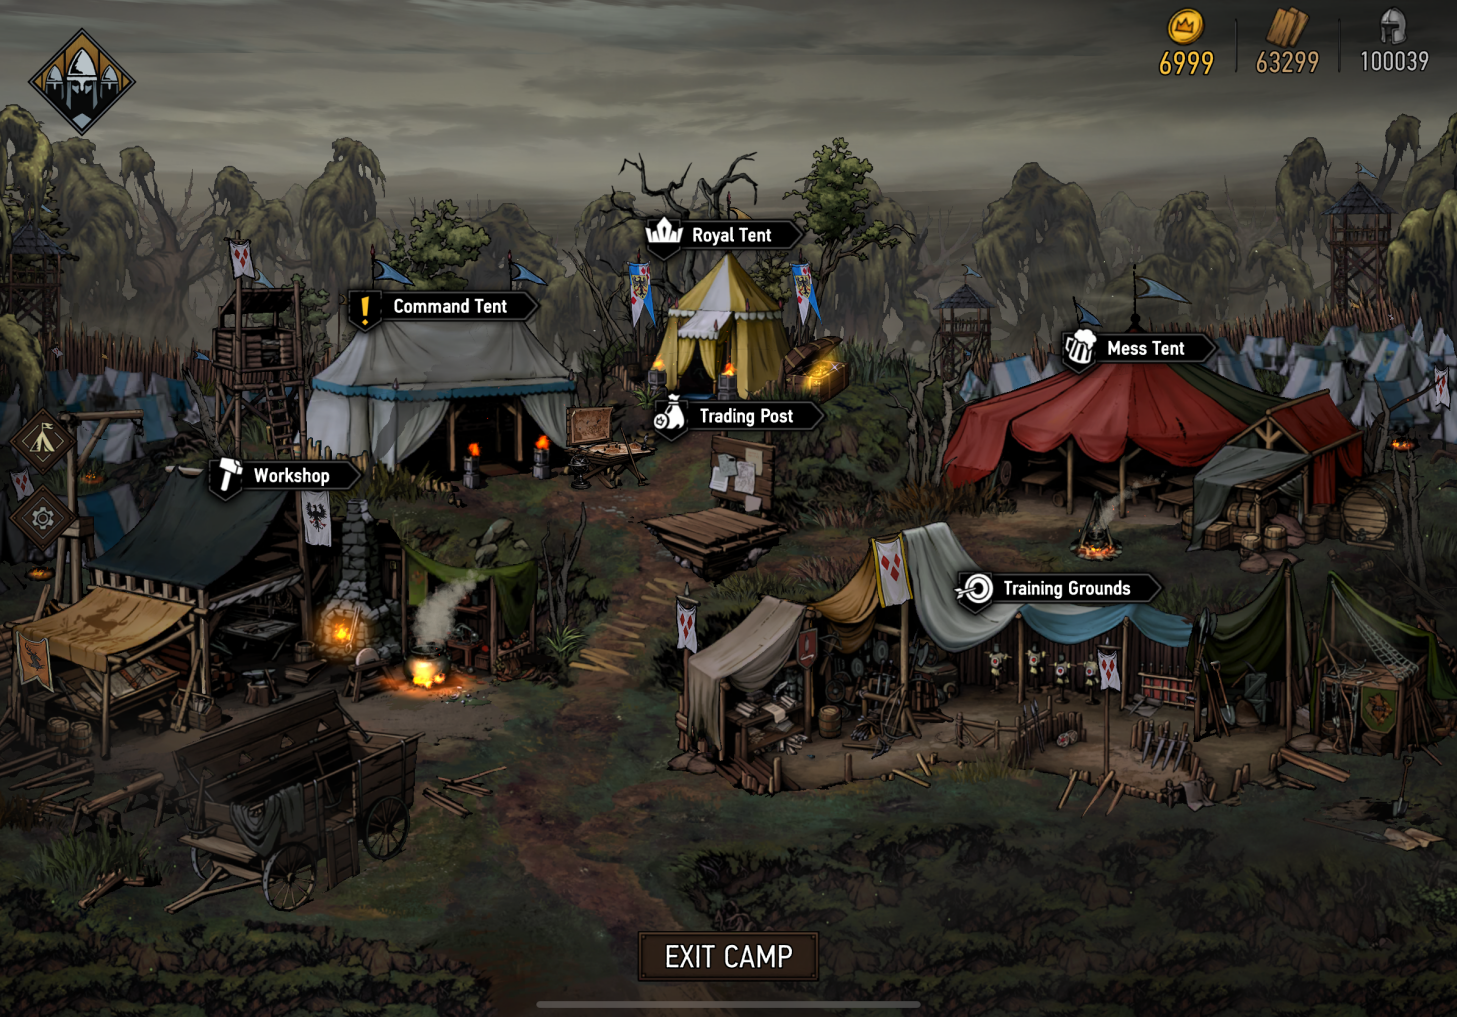 Thronebreaker has arrived on iOS! - Image 2